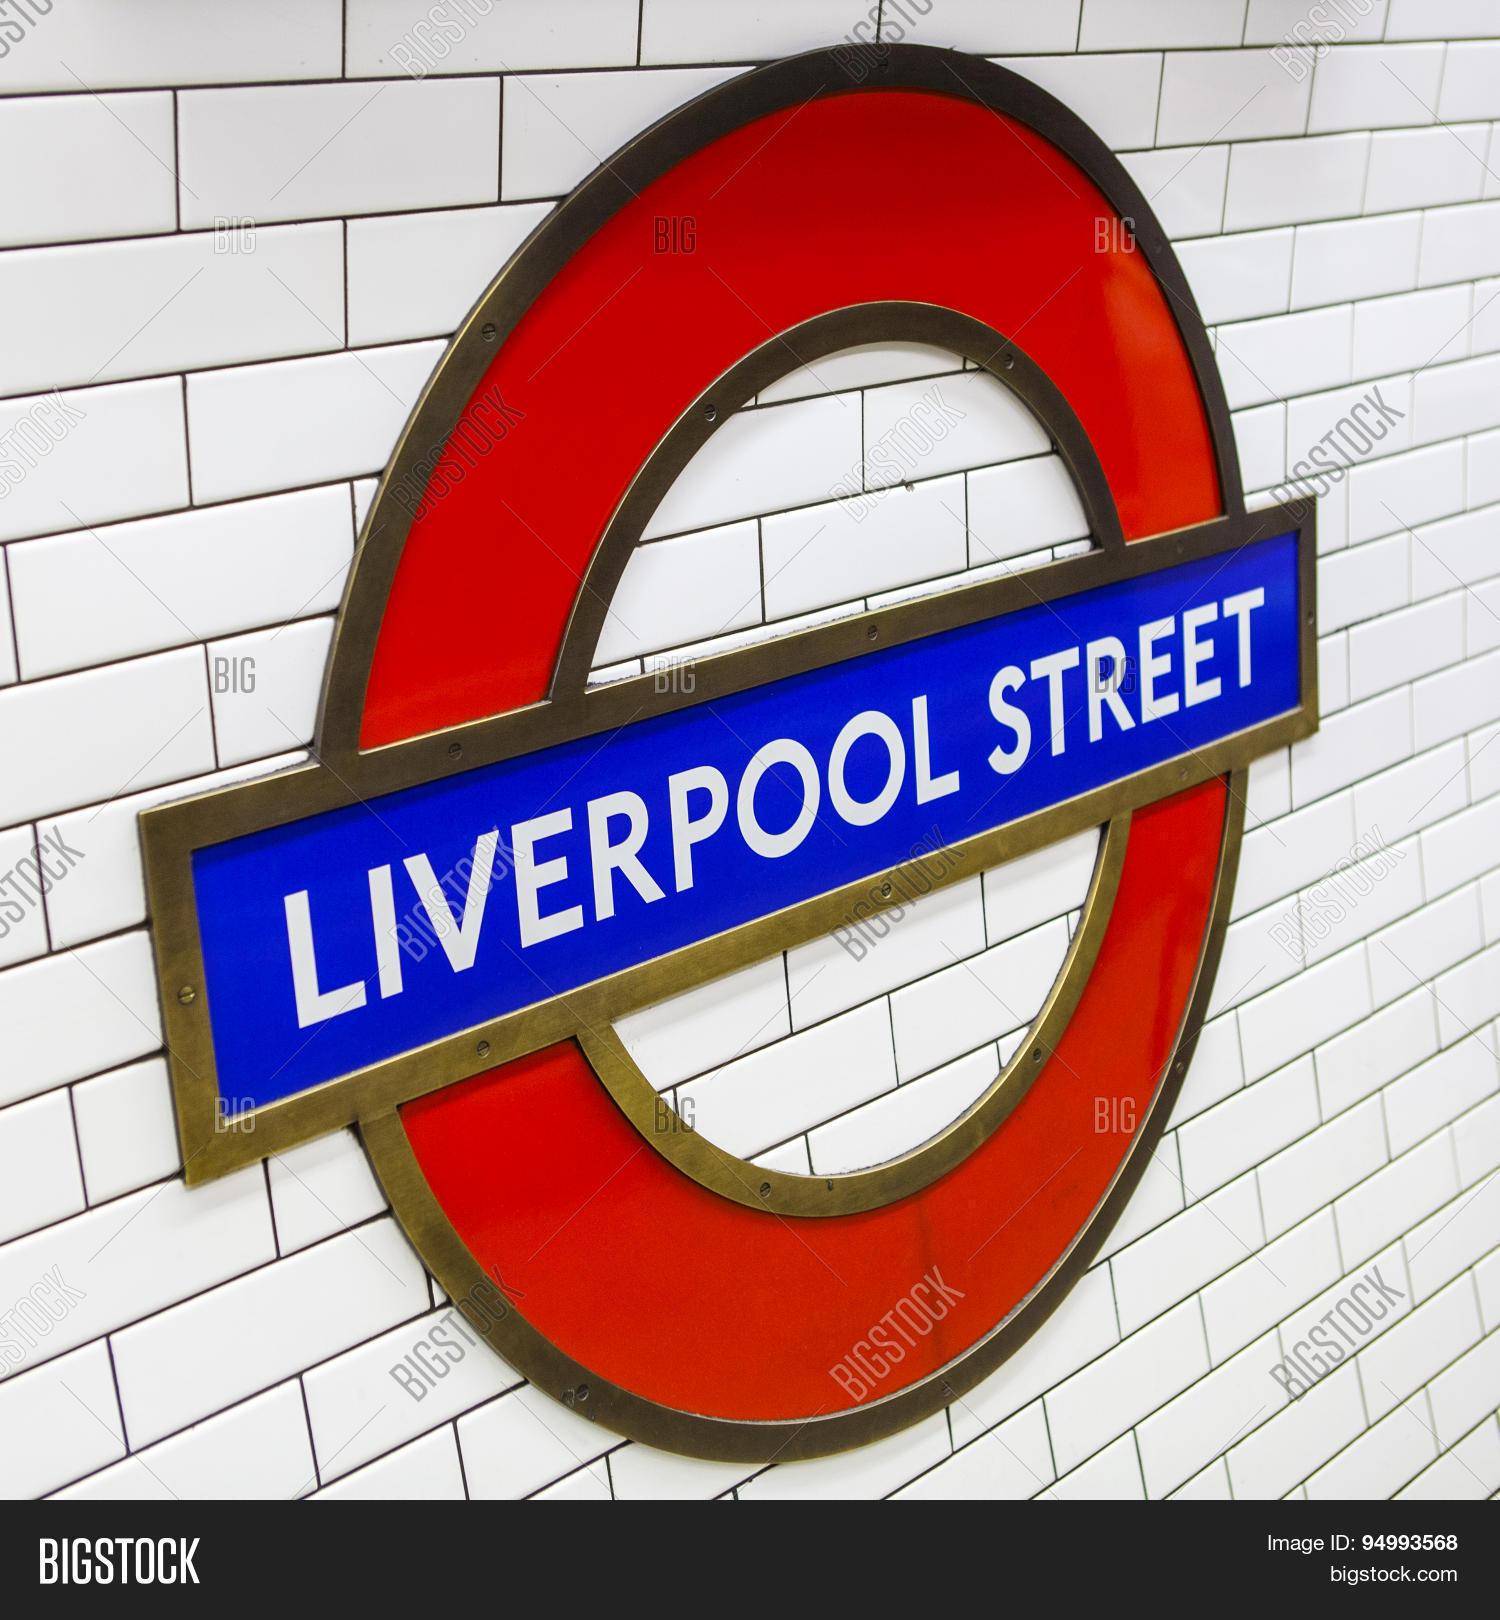 Liverpool Street Image Photo Free Trial Bigstock